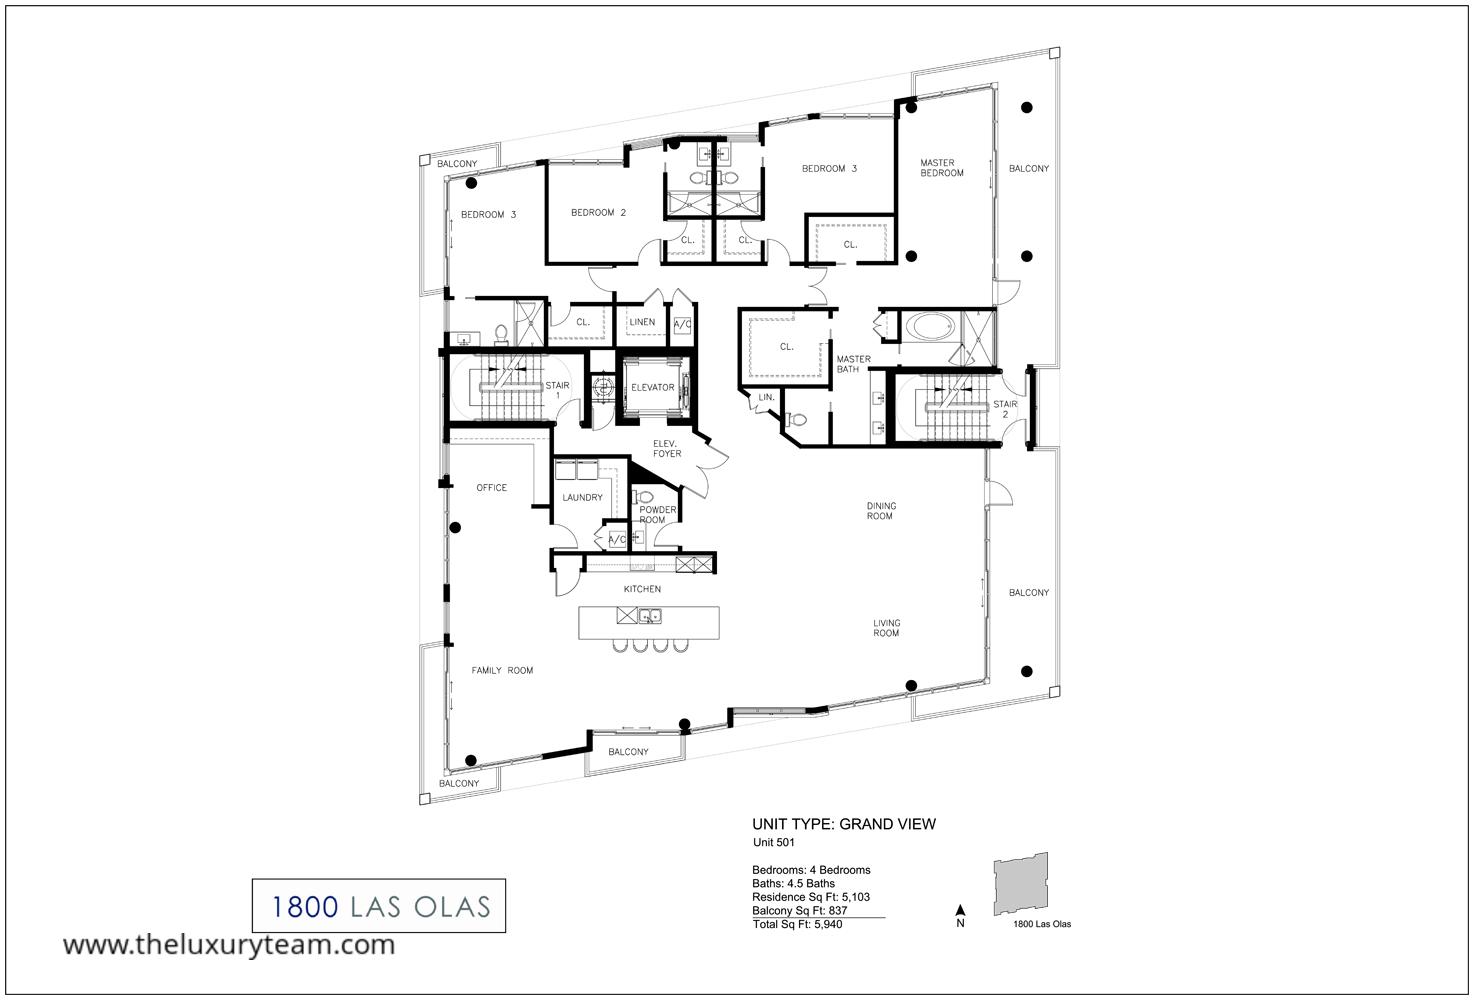 Fort Lauderdale Condos For Sale 1800 Las Olas The Luxury Team